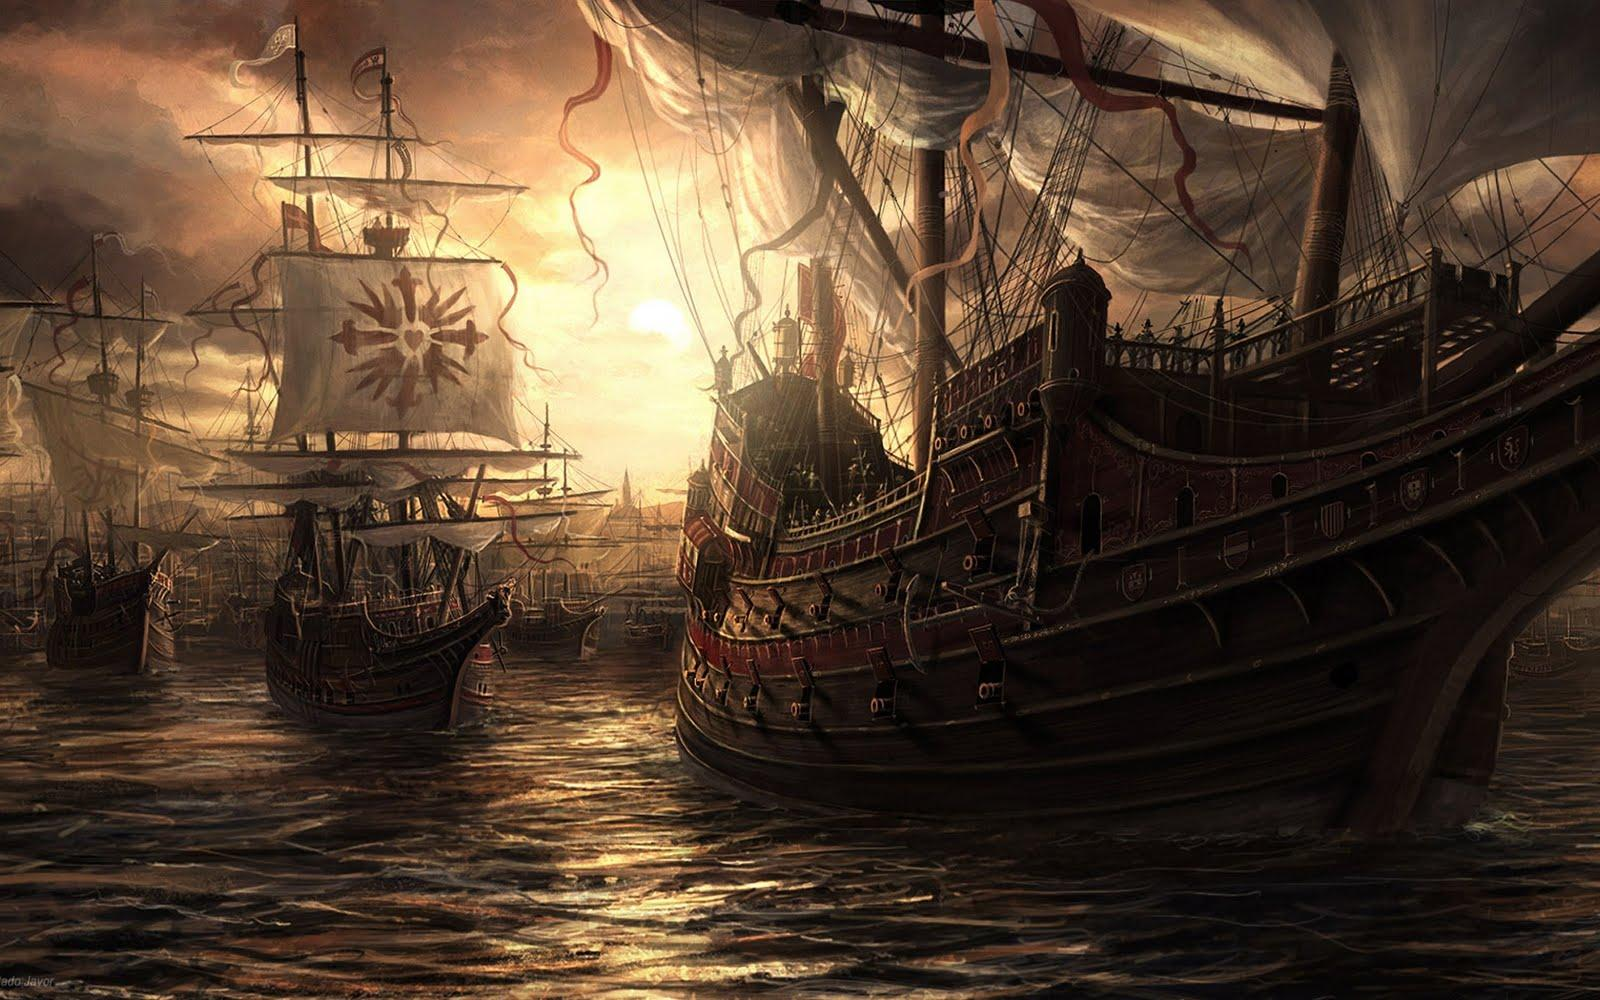 pirates wallpaper mario - photo #36